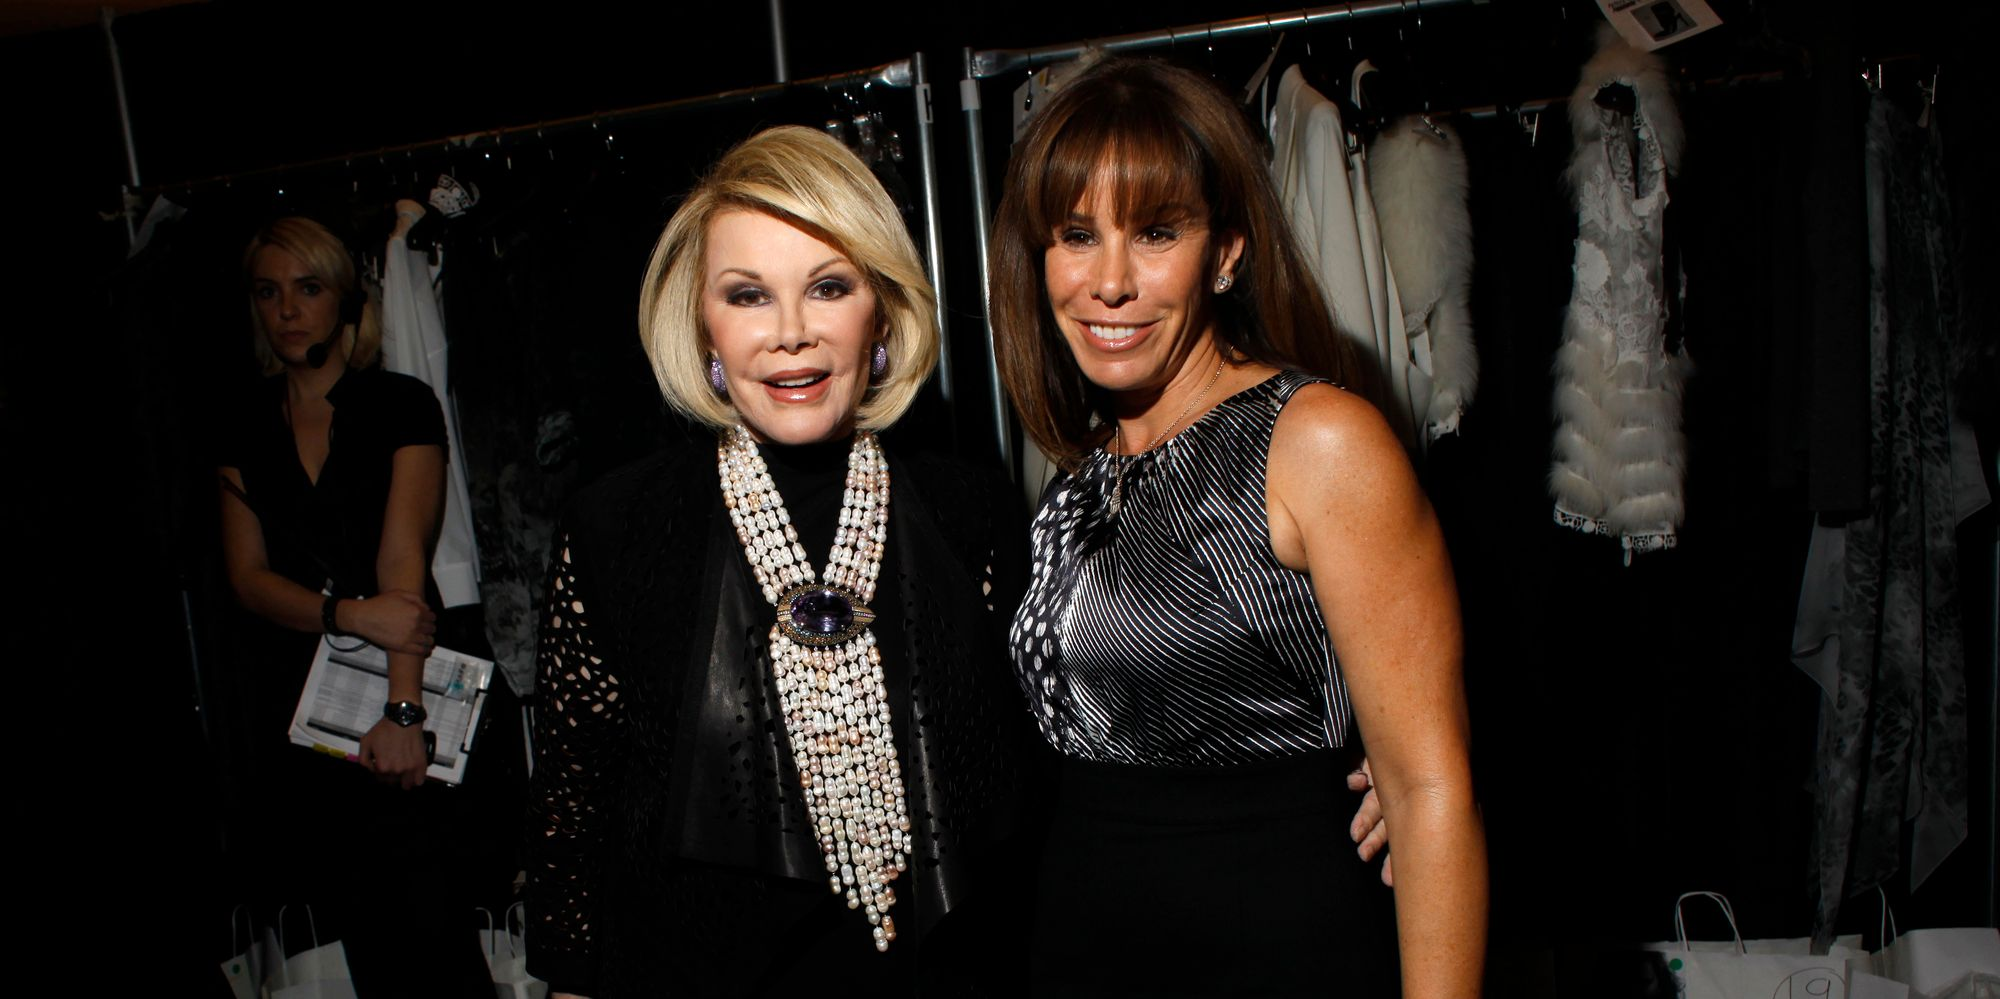 Joan Rivers' Daughter Settles Malpractice Suit Against Doctors